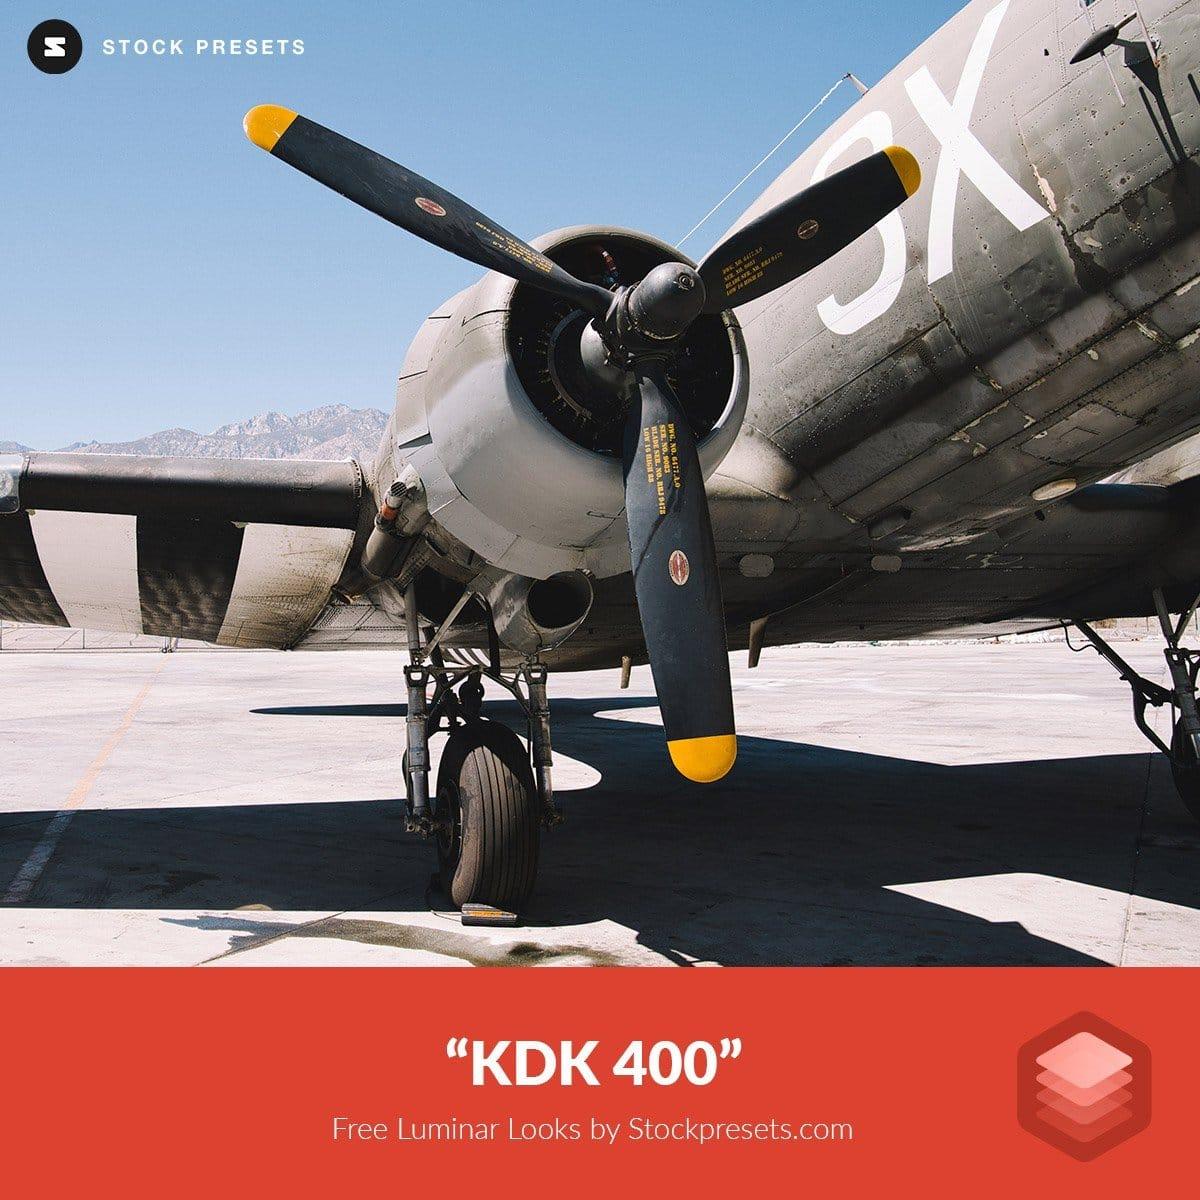 Free-Luminar-Look-_-KDK-400-Preset-Stockpresets.com